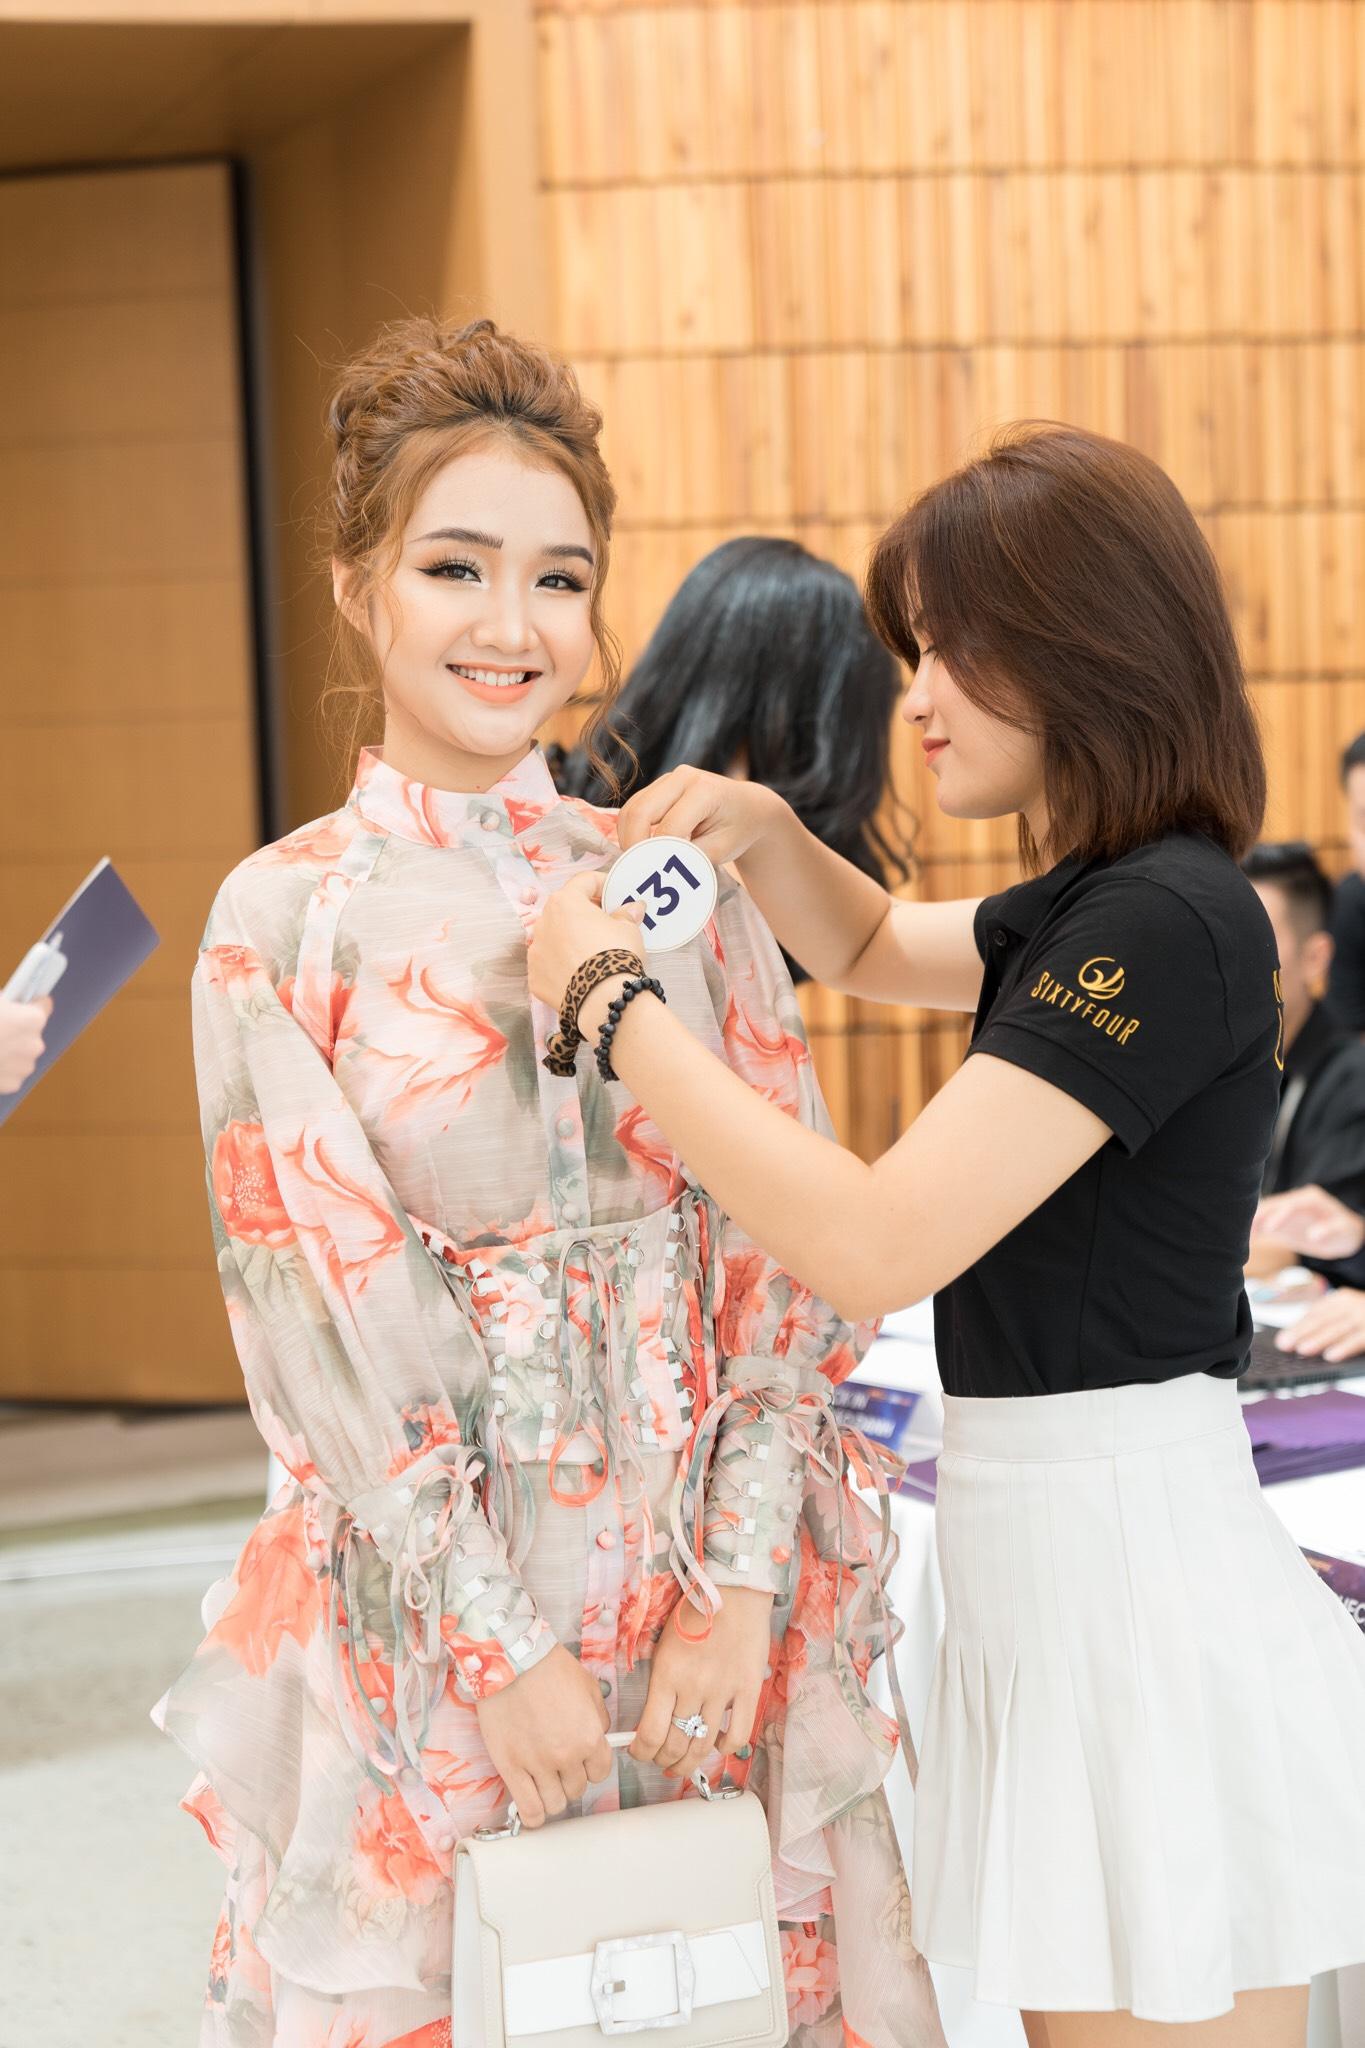 Thi sinh Hoa hau Hoan vu Viet Nam 2019 (5)